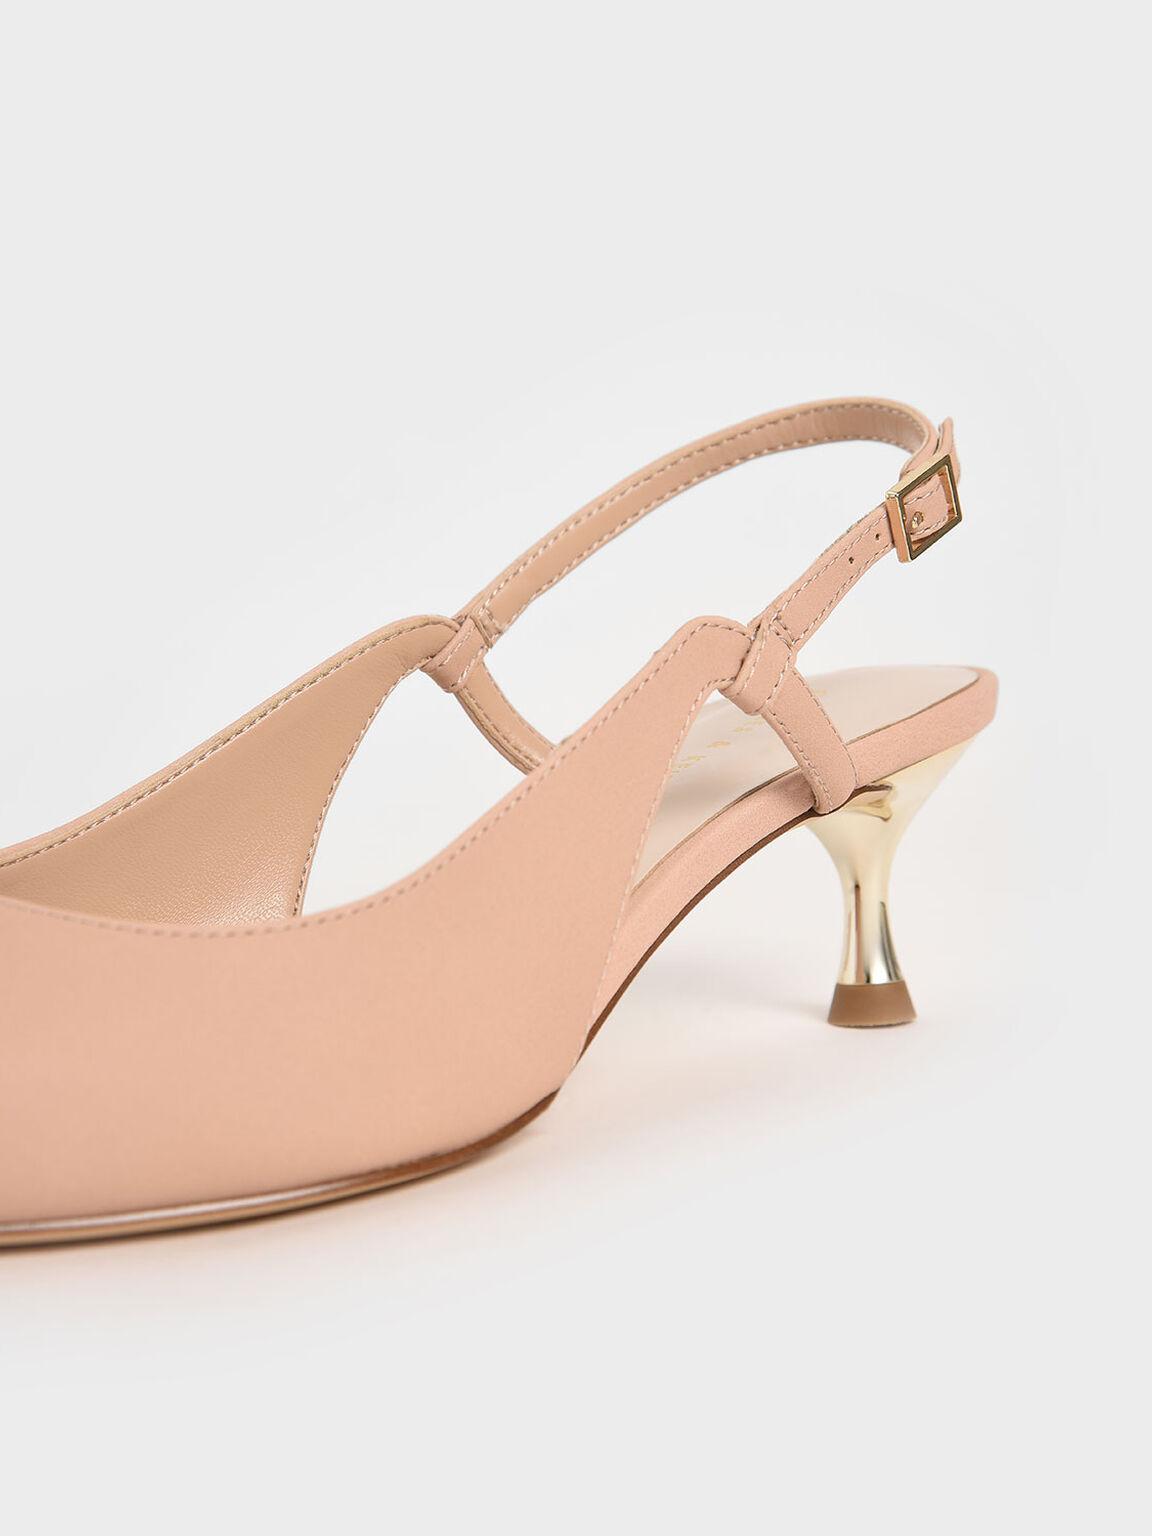 Sepatu Cut-Out Slingback Kitten Heel Pumps, Nude, hi-res